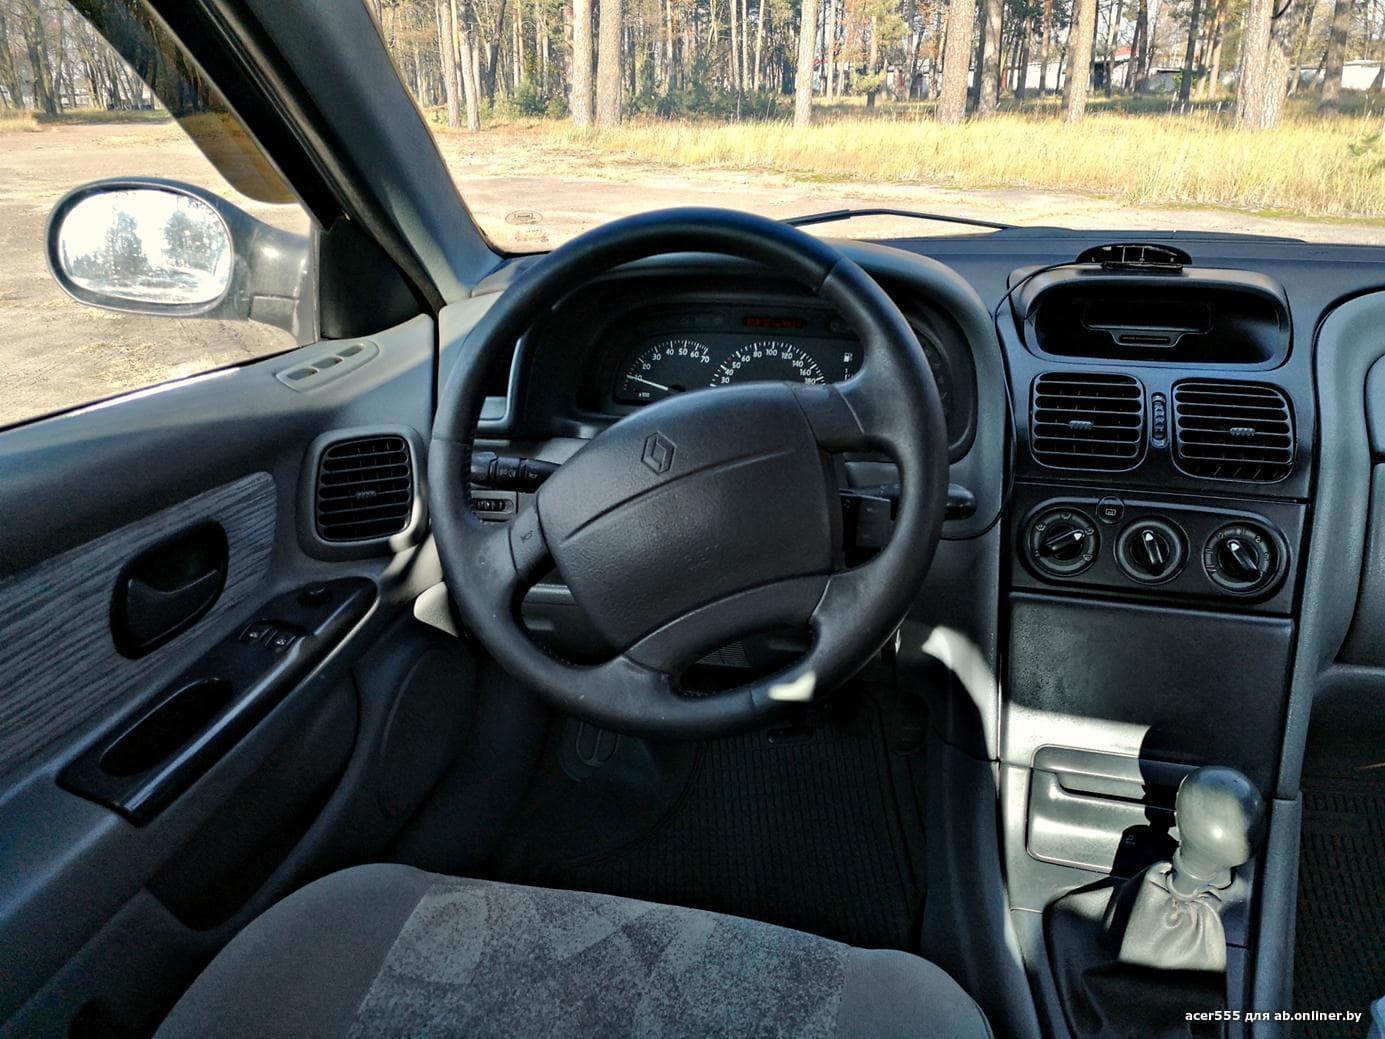 Renault Laguna dTi